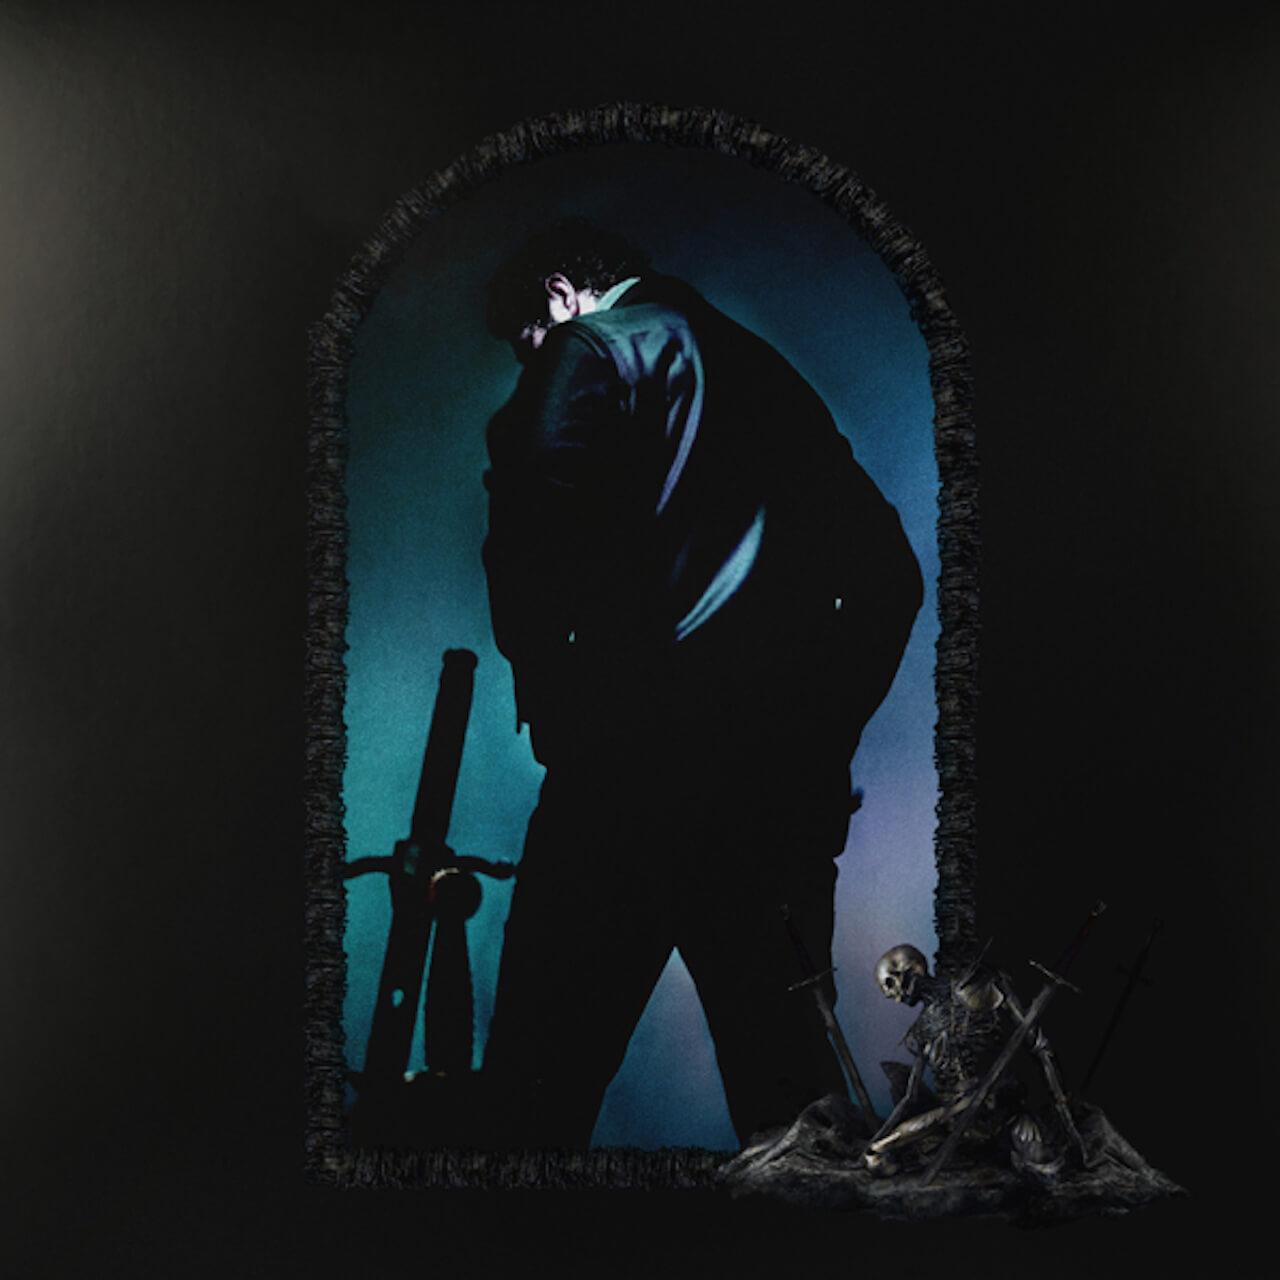 Post Maloneが待望の3rdアルバム『Hollywood's Bleeding』のデジタル配信を本日スタート オジー・オズボーン、SZA、トラヴィス・スコットらが参加 music190906-postmalone-1